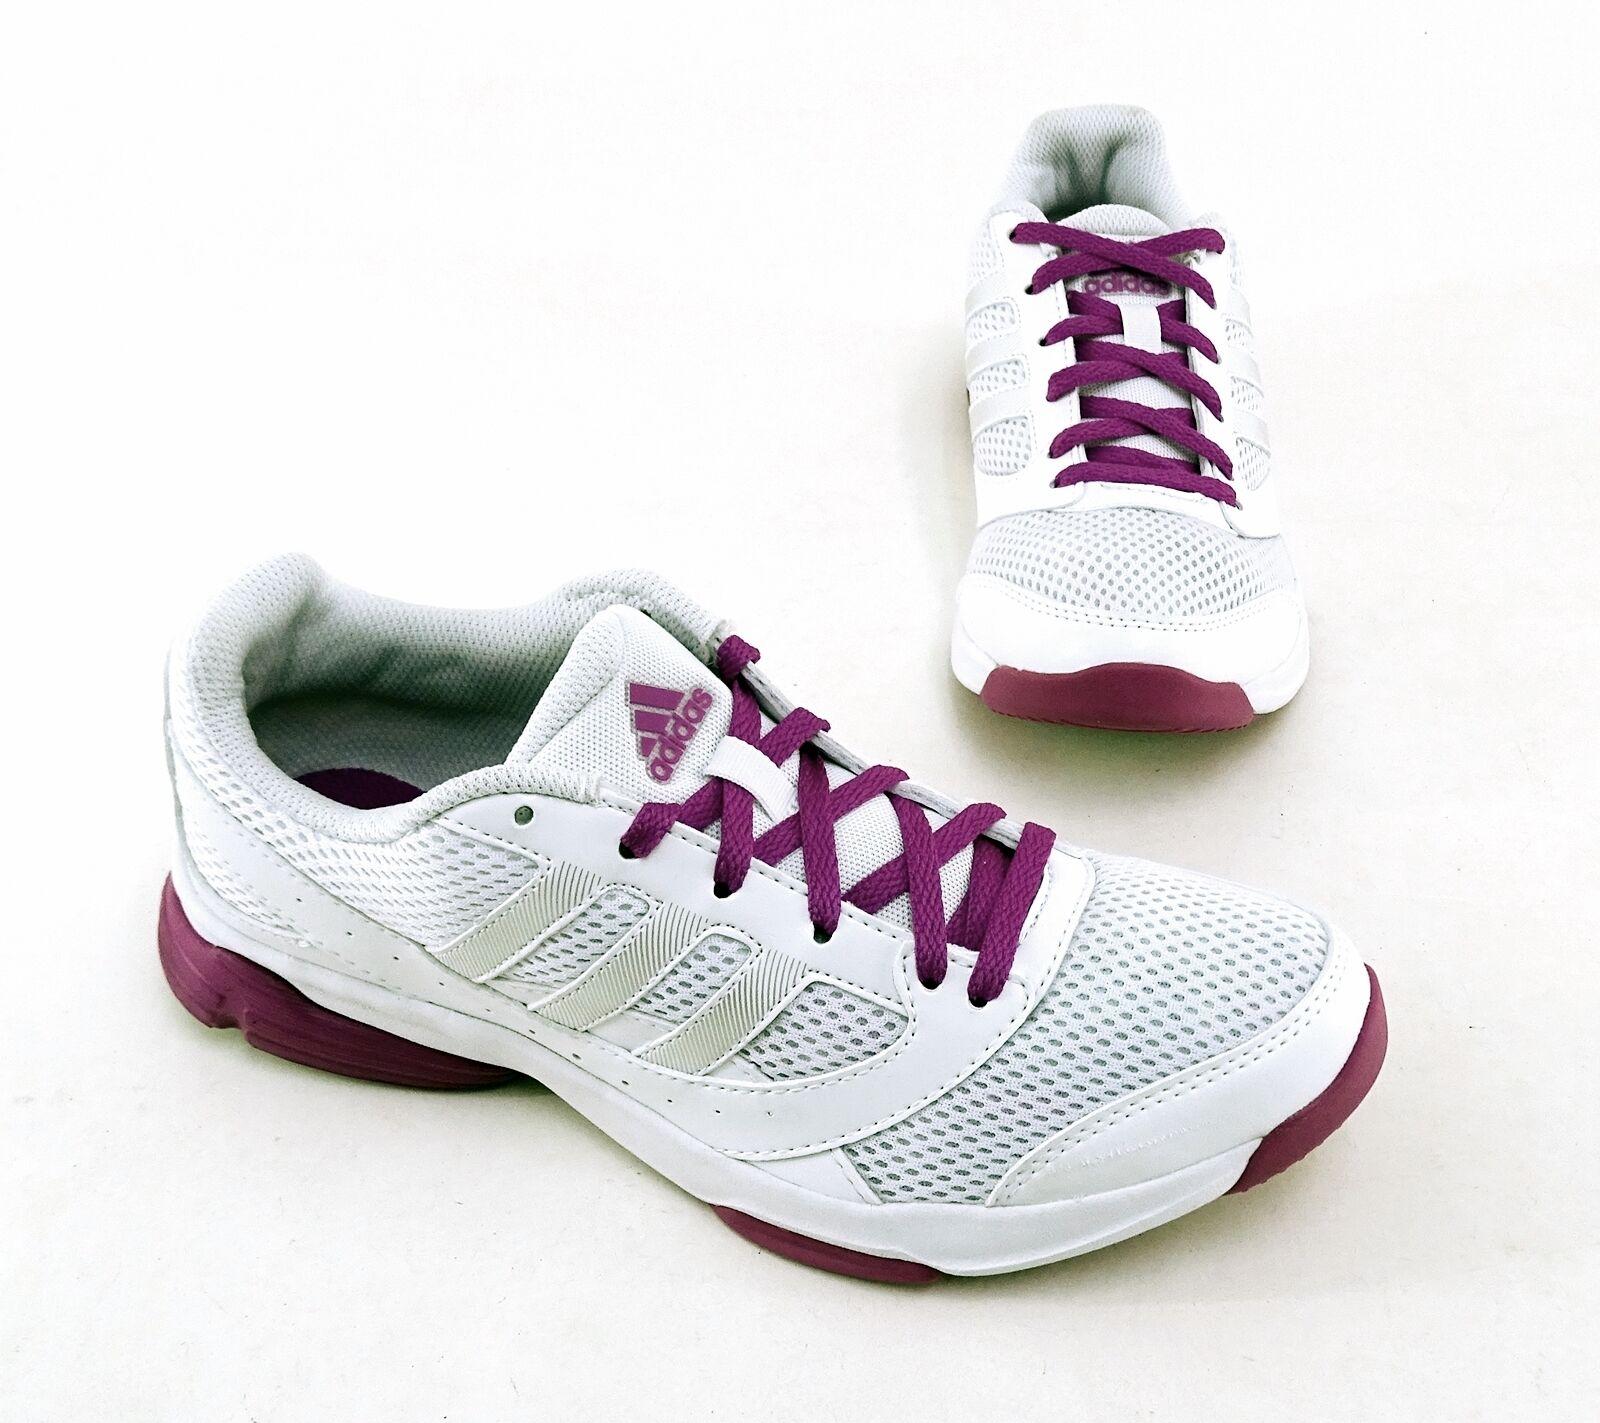 Laufschuhe Adidas training Indoor Kunstleder Textil white purple Gr. 6 = 39 1 3